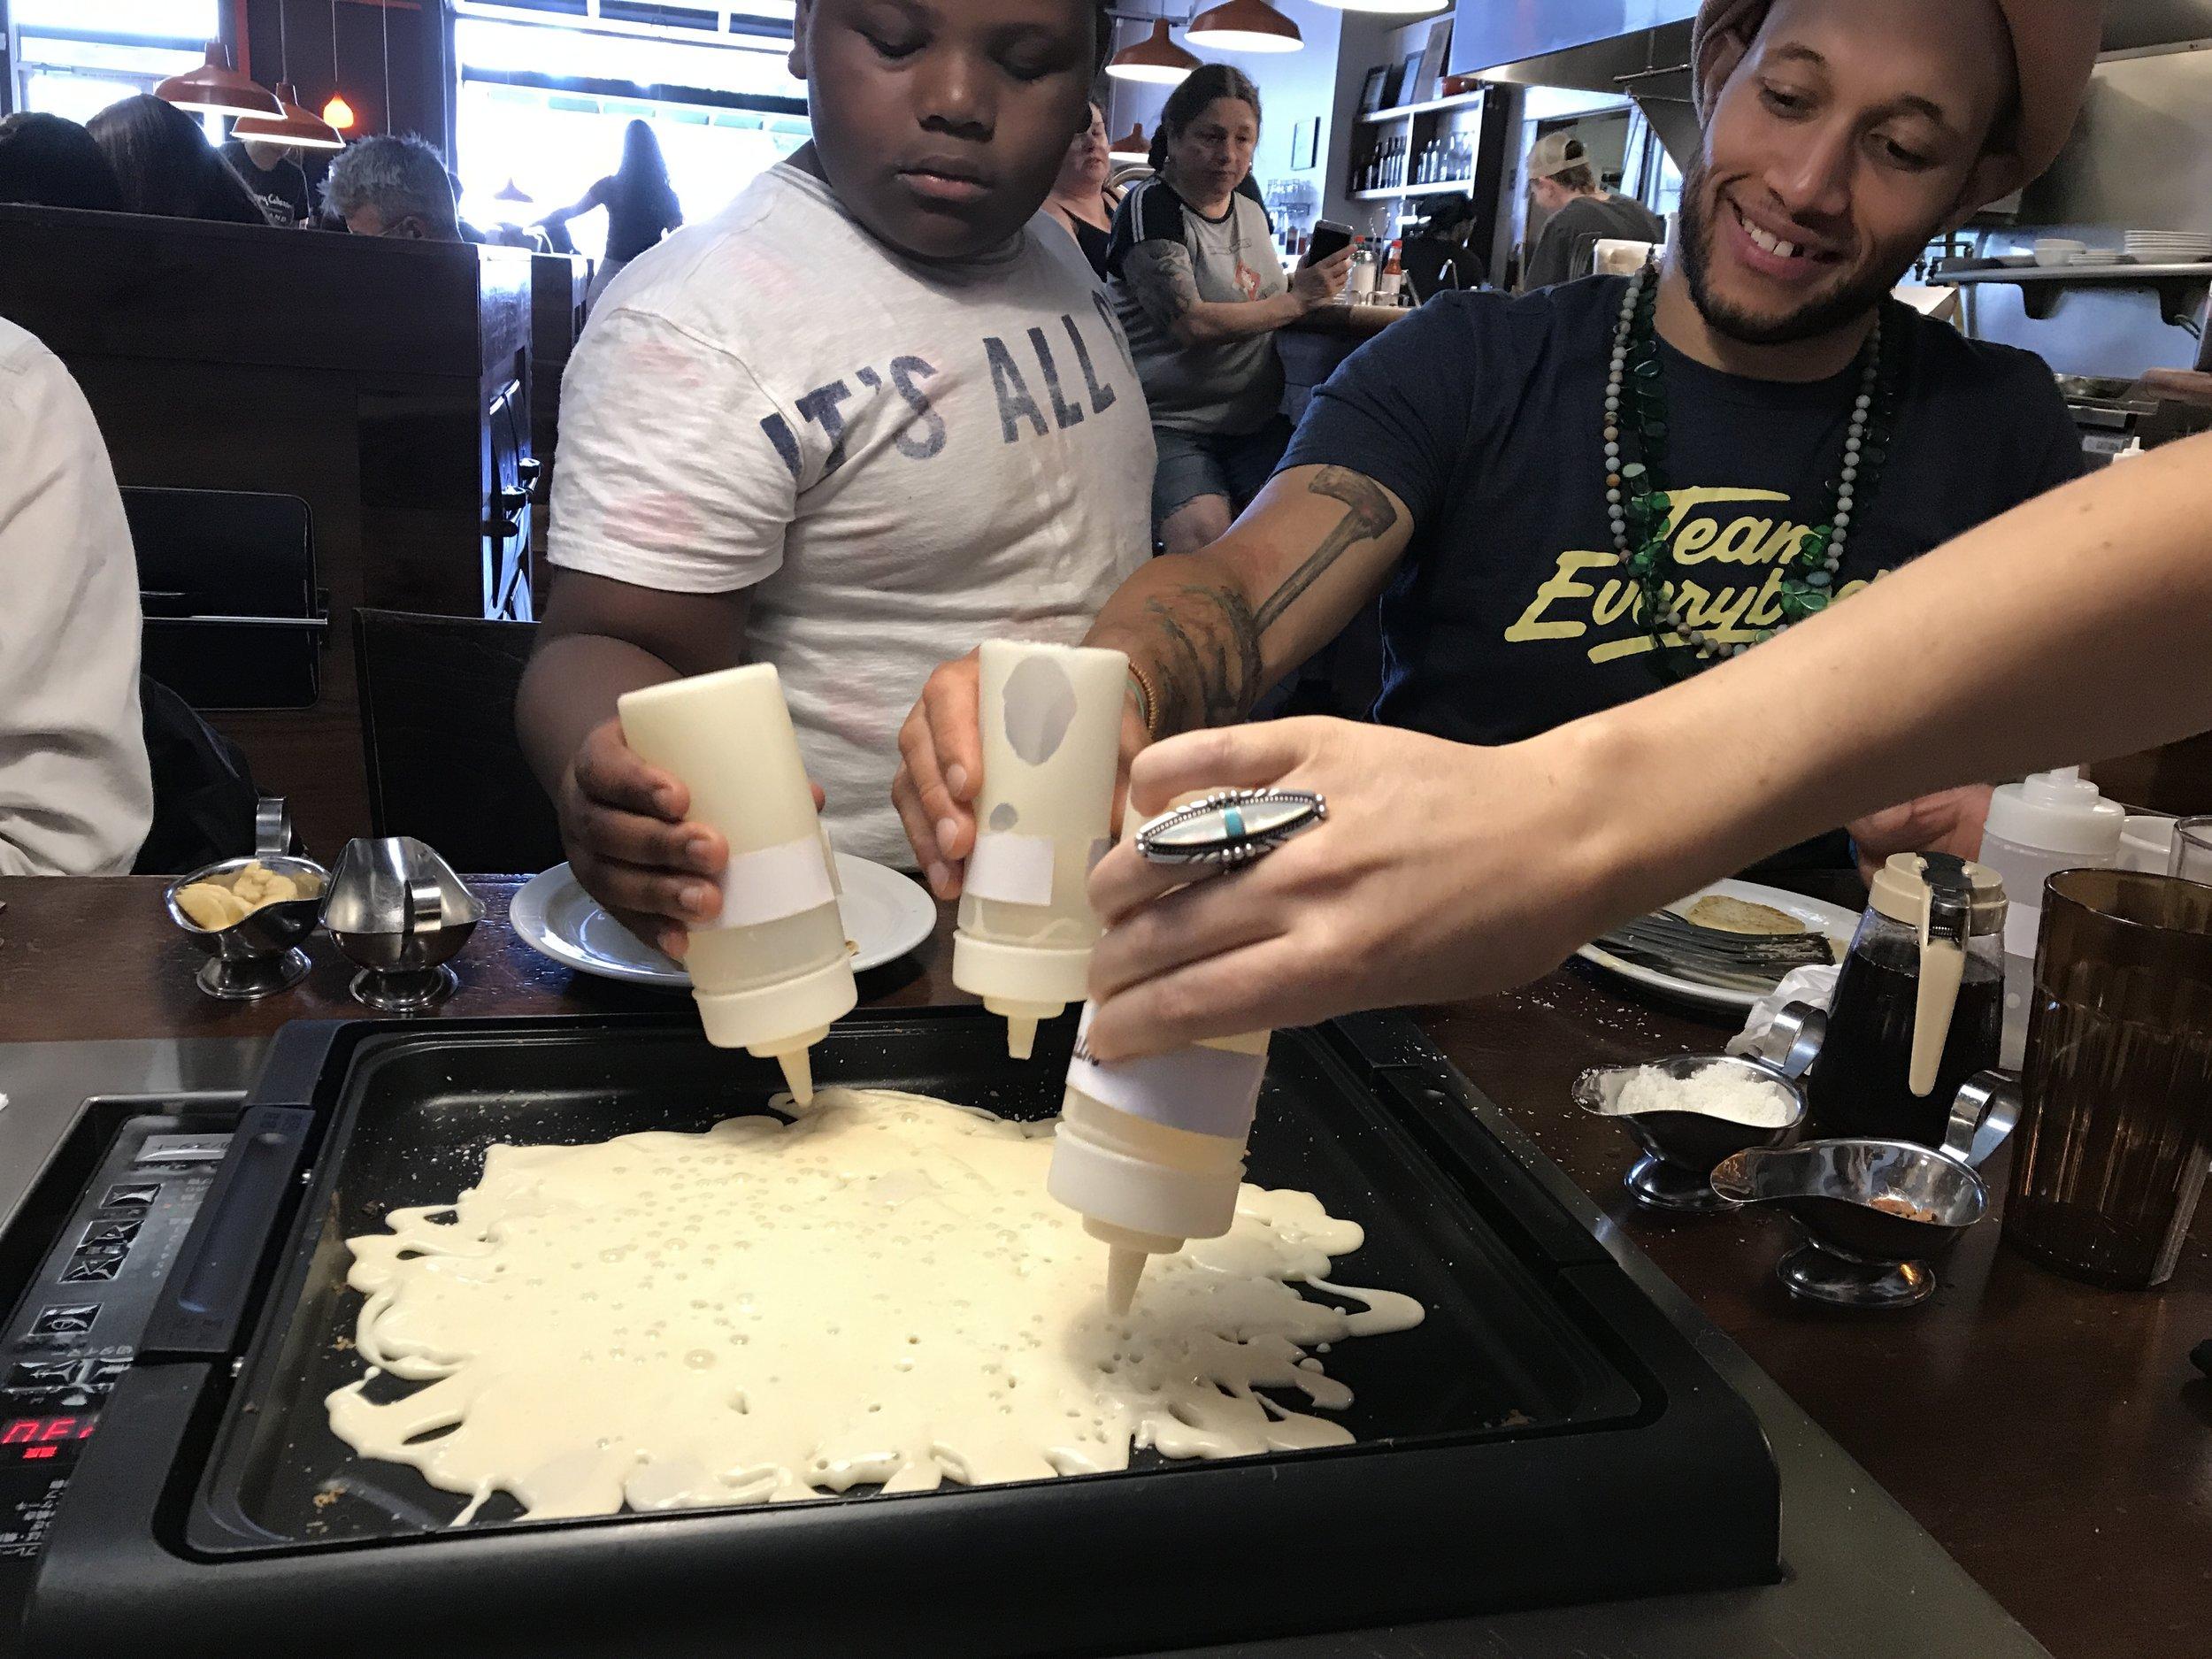 Pancake drawing workshop at Slappy Cakes in SE Portland.